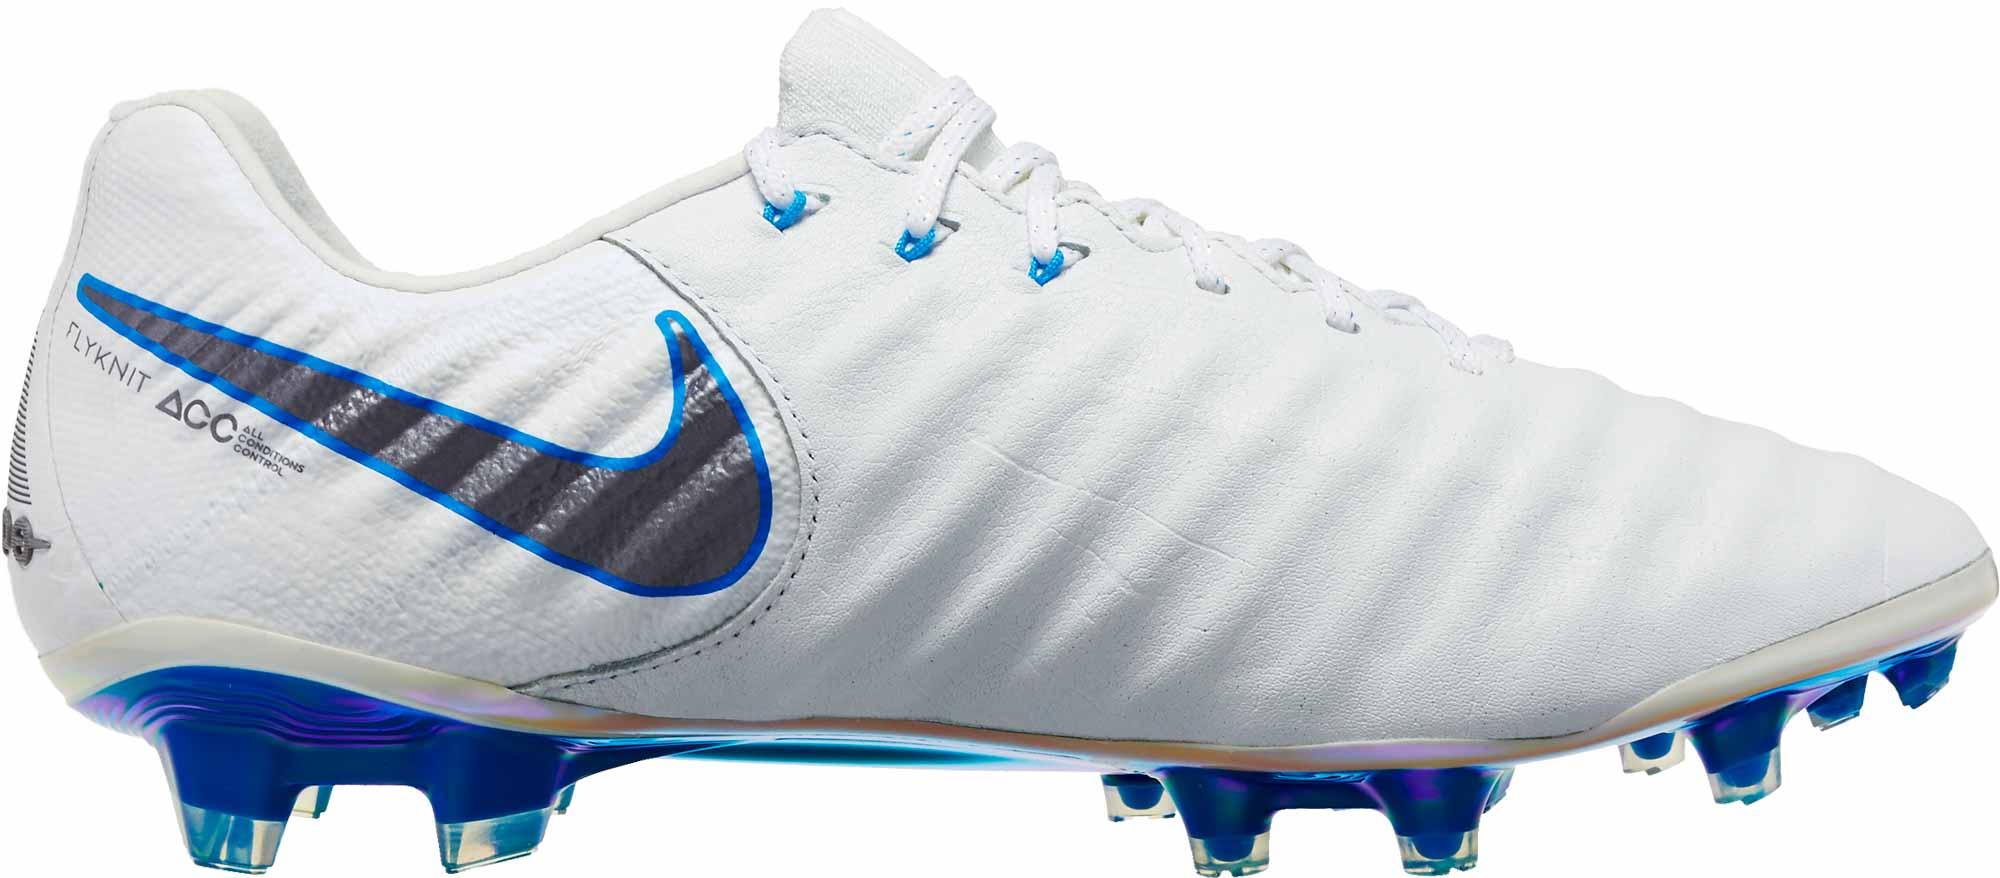 f2d319afb46 Nike Tiempo Legend VII Elite FG - White Metallic Cool Grey - SoccerPro